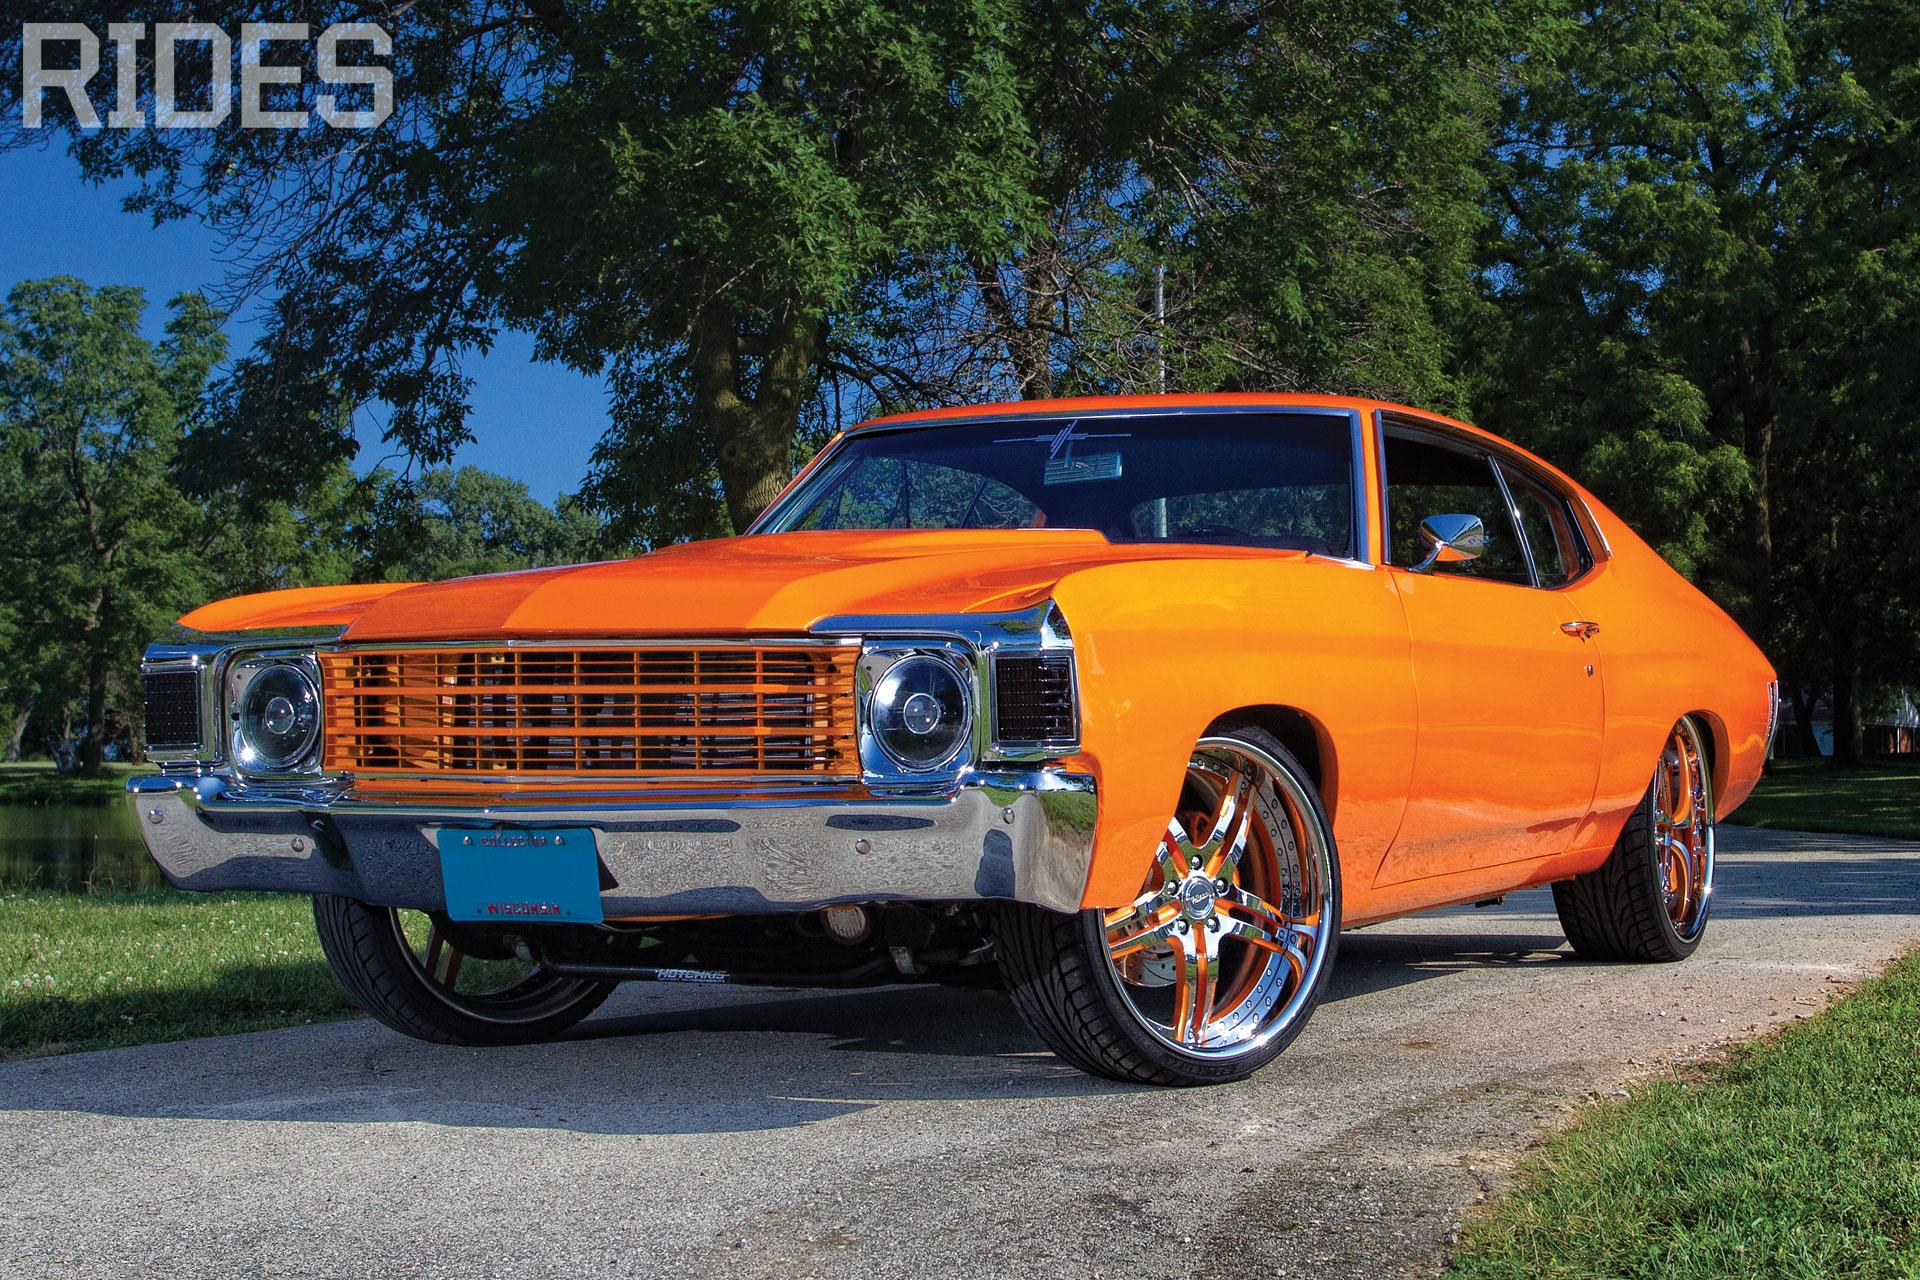 rides cars chevy-chevelle-orange-wallpaper chevrolet 1972